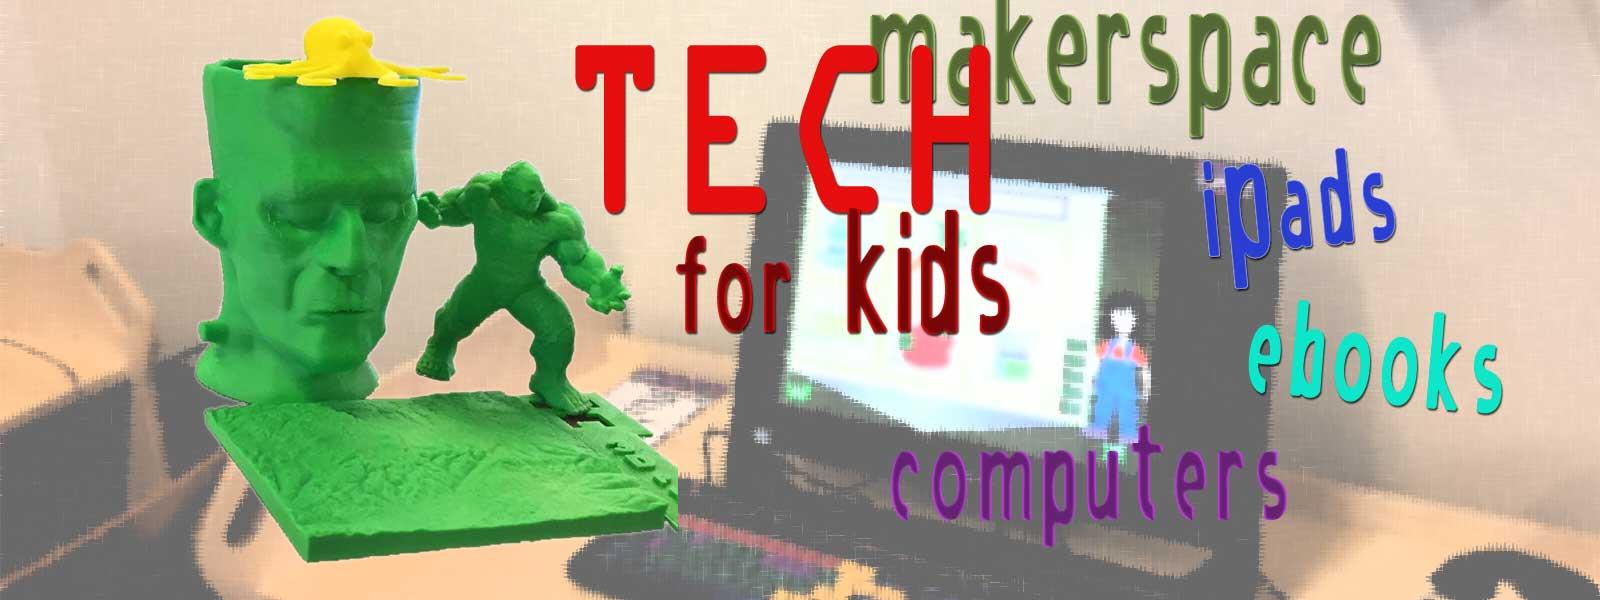 Tech For Kids 2